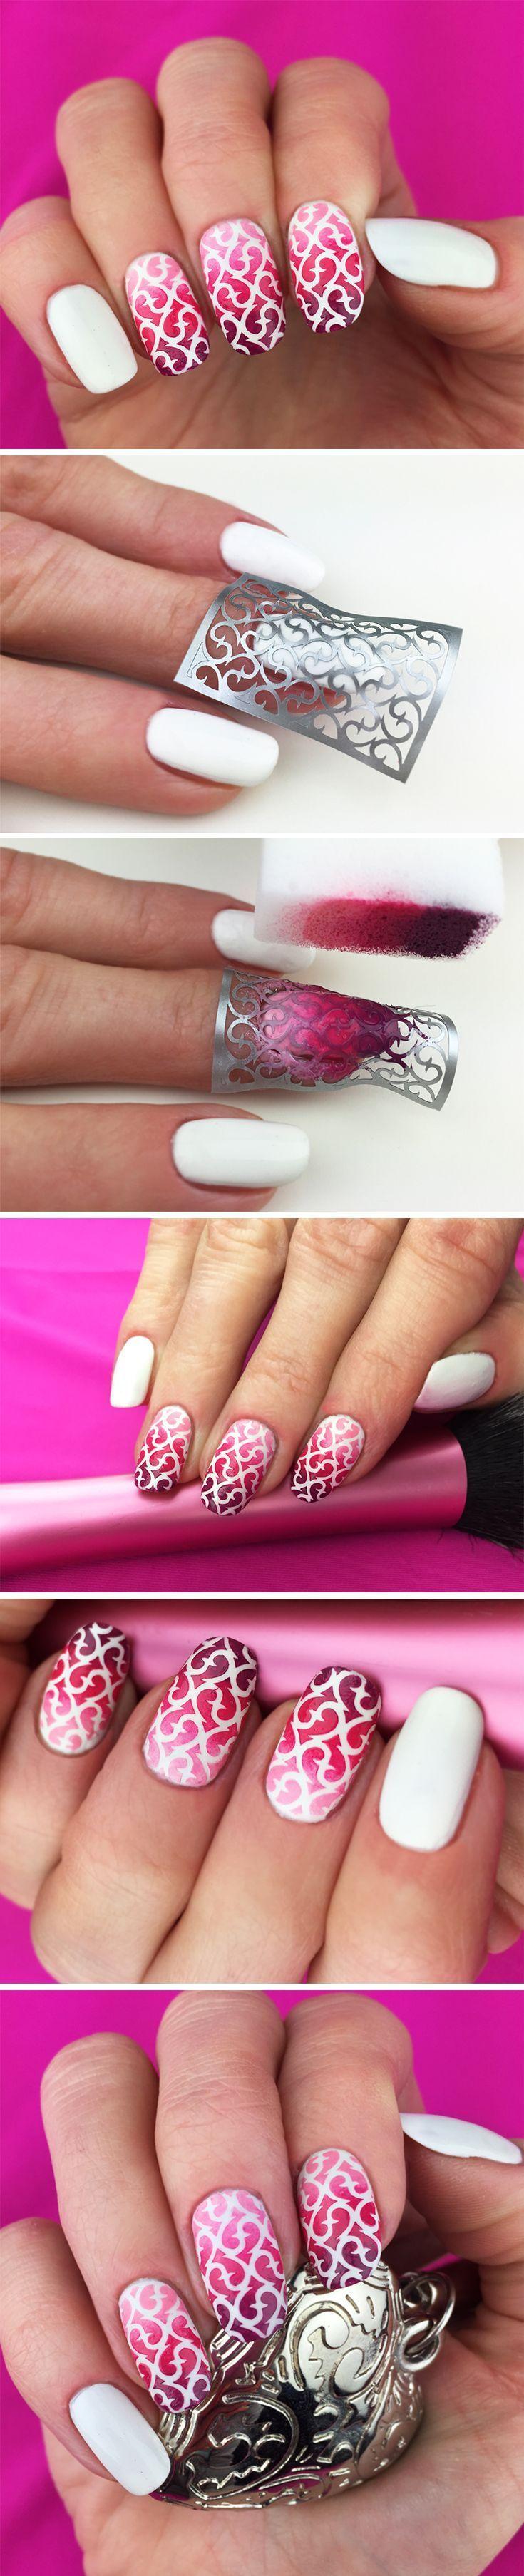 196 best Gel Nails Design images on Pinterest | Nail scissors ...